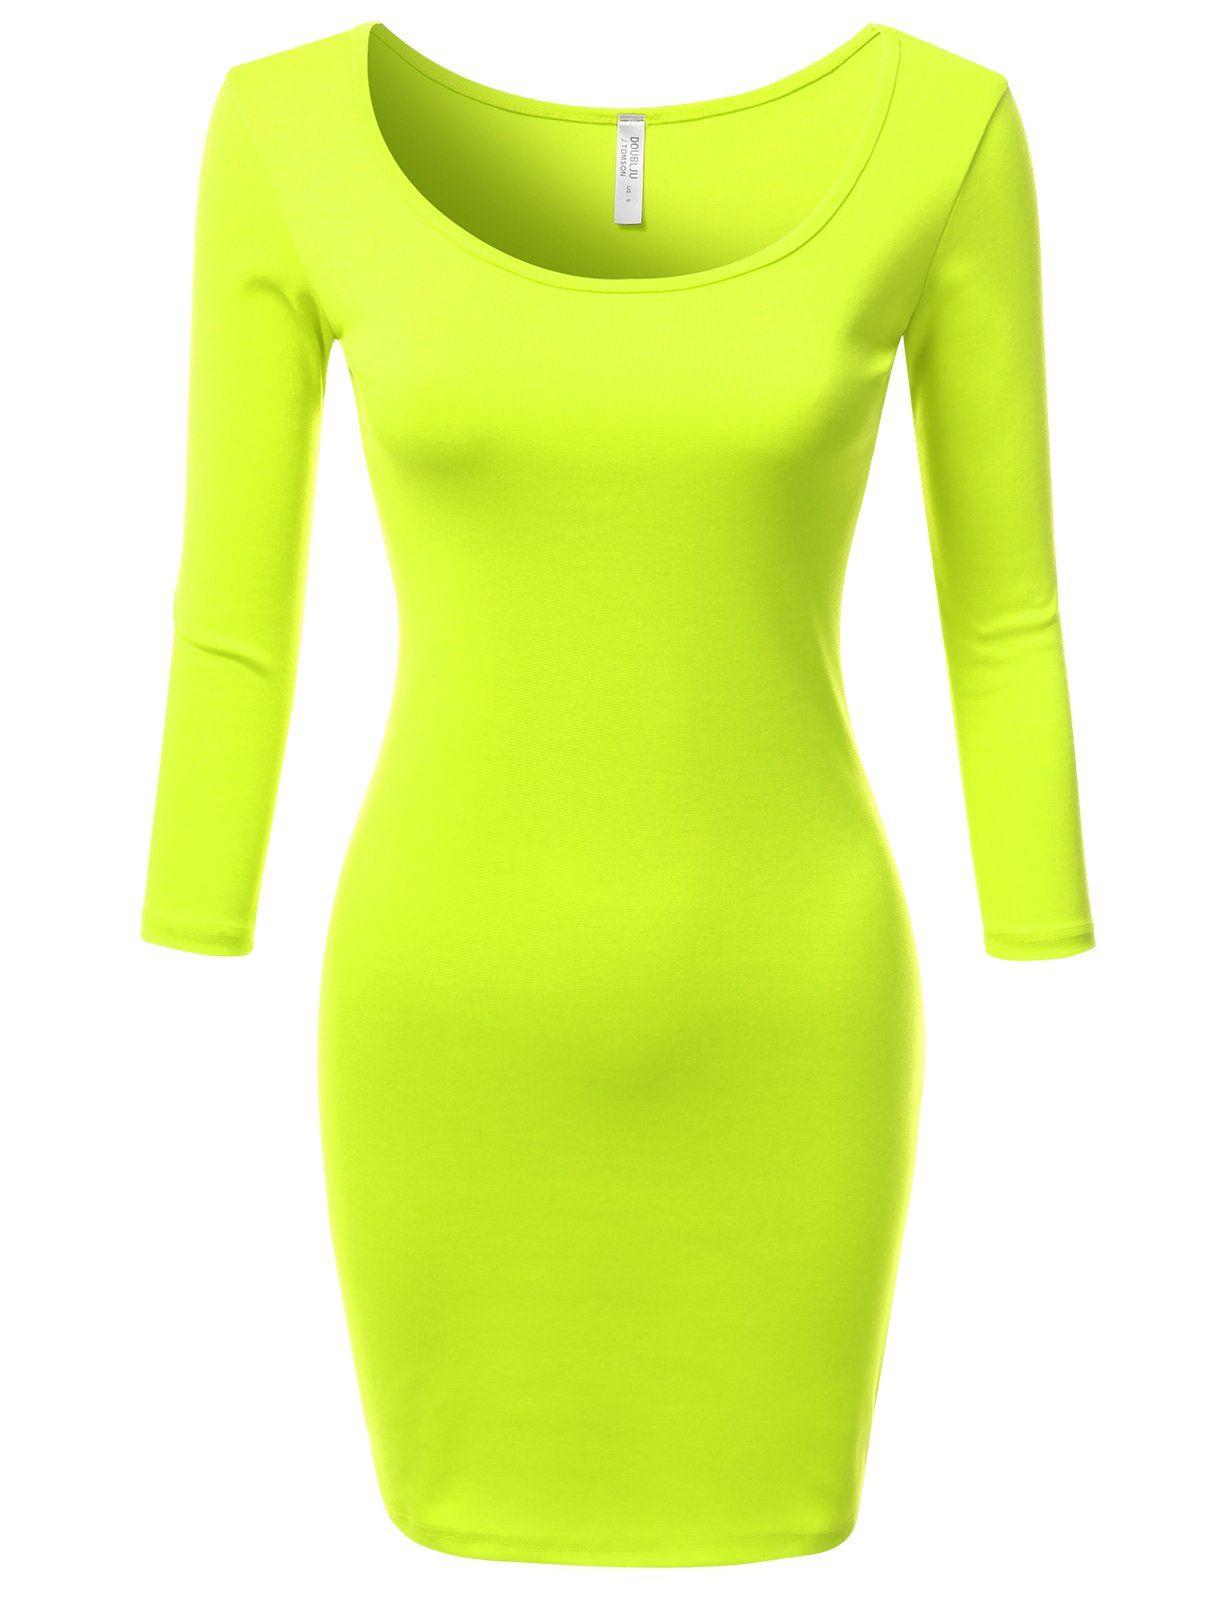 J.TOMSON Women's Wide Round Neck 3/4 Sleeve Raglan Bodycon Mini Short Dress | Amazon.com